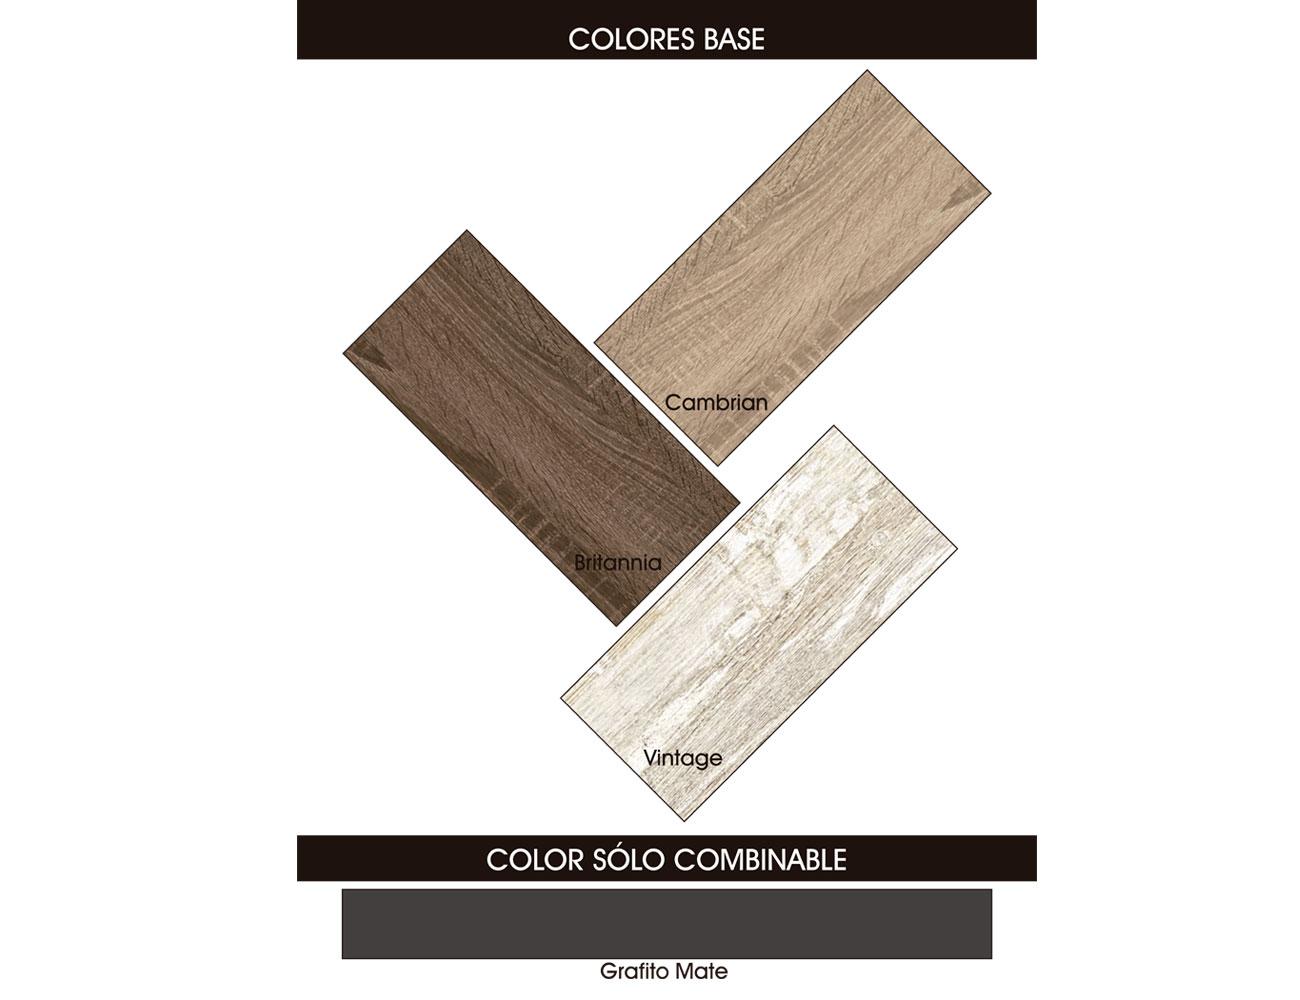 Colores 261